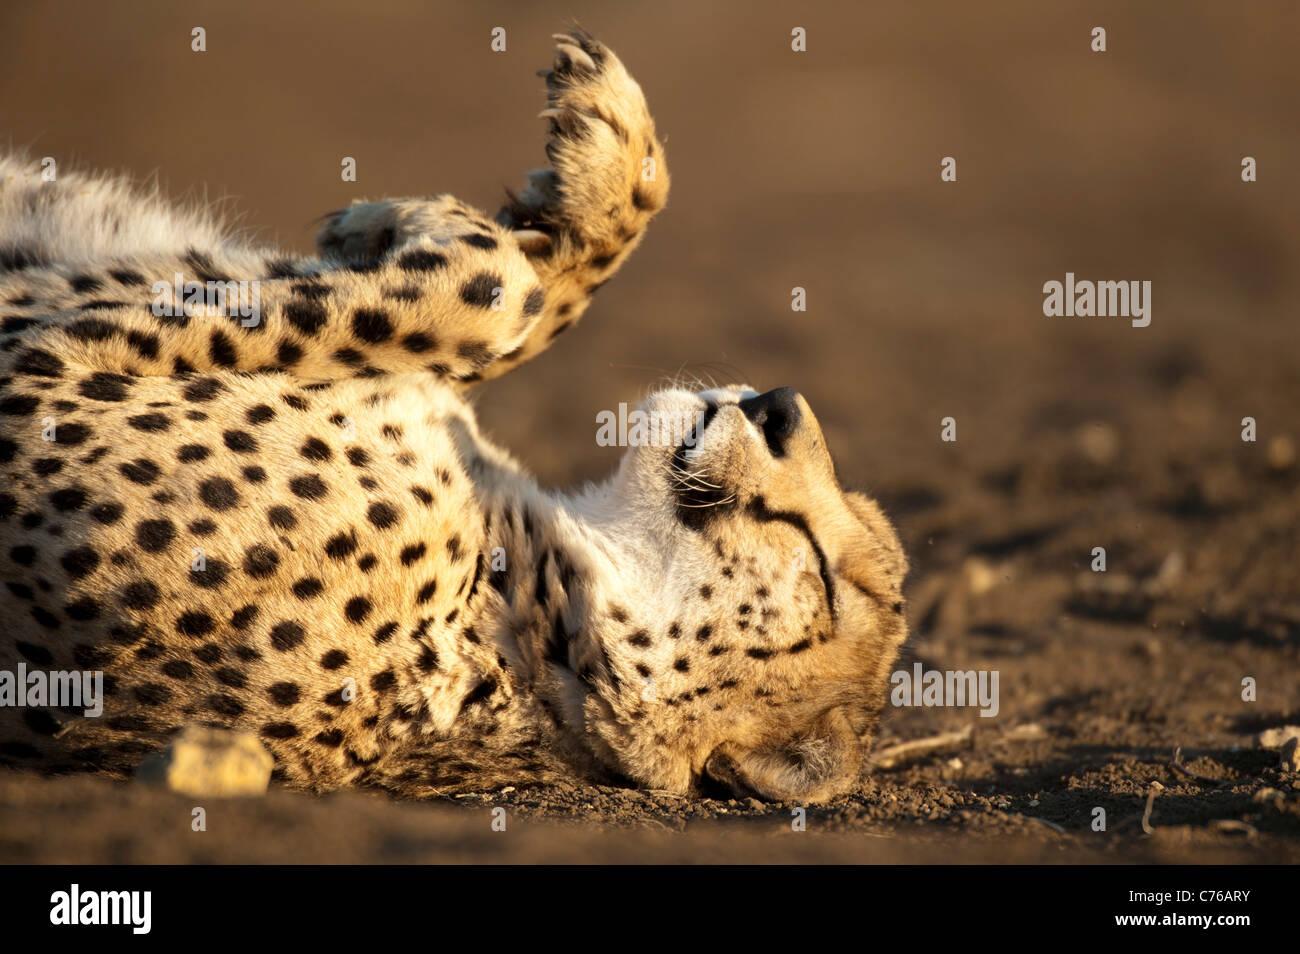 Guepardo (Acinonyx jubatus), Phinda Game Reserve, Sudáfrica Imagen De Stock